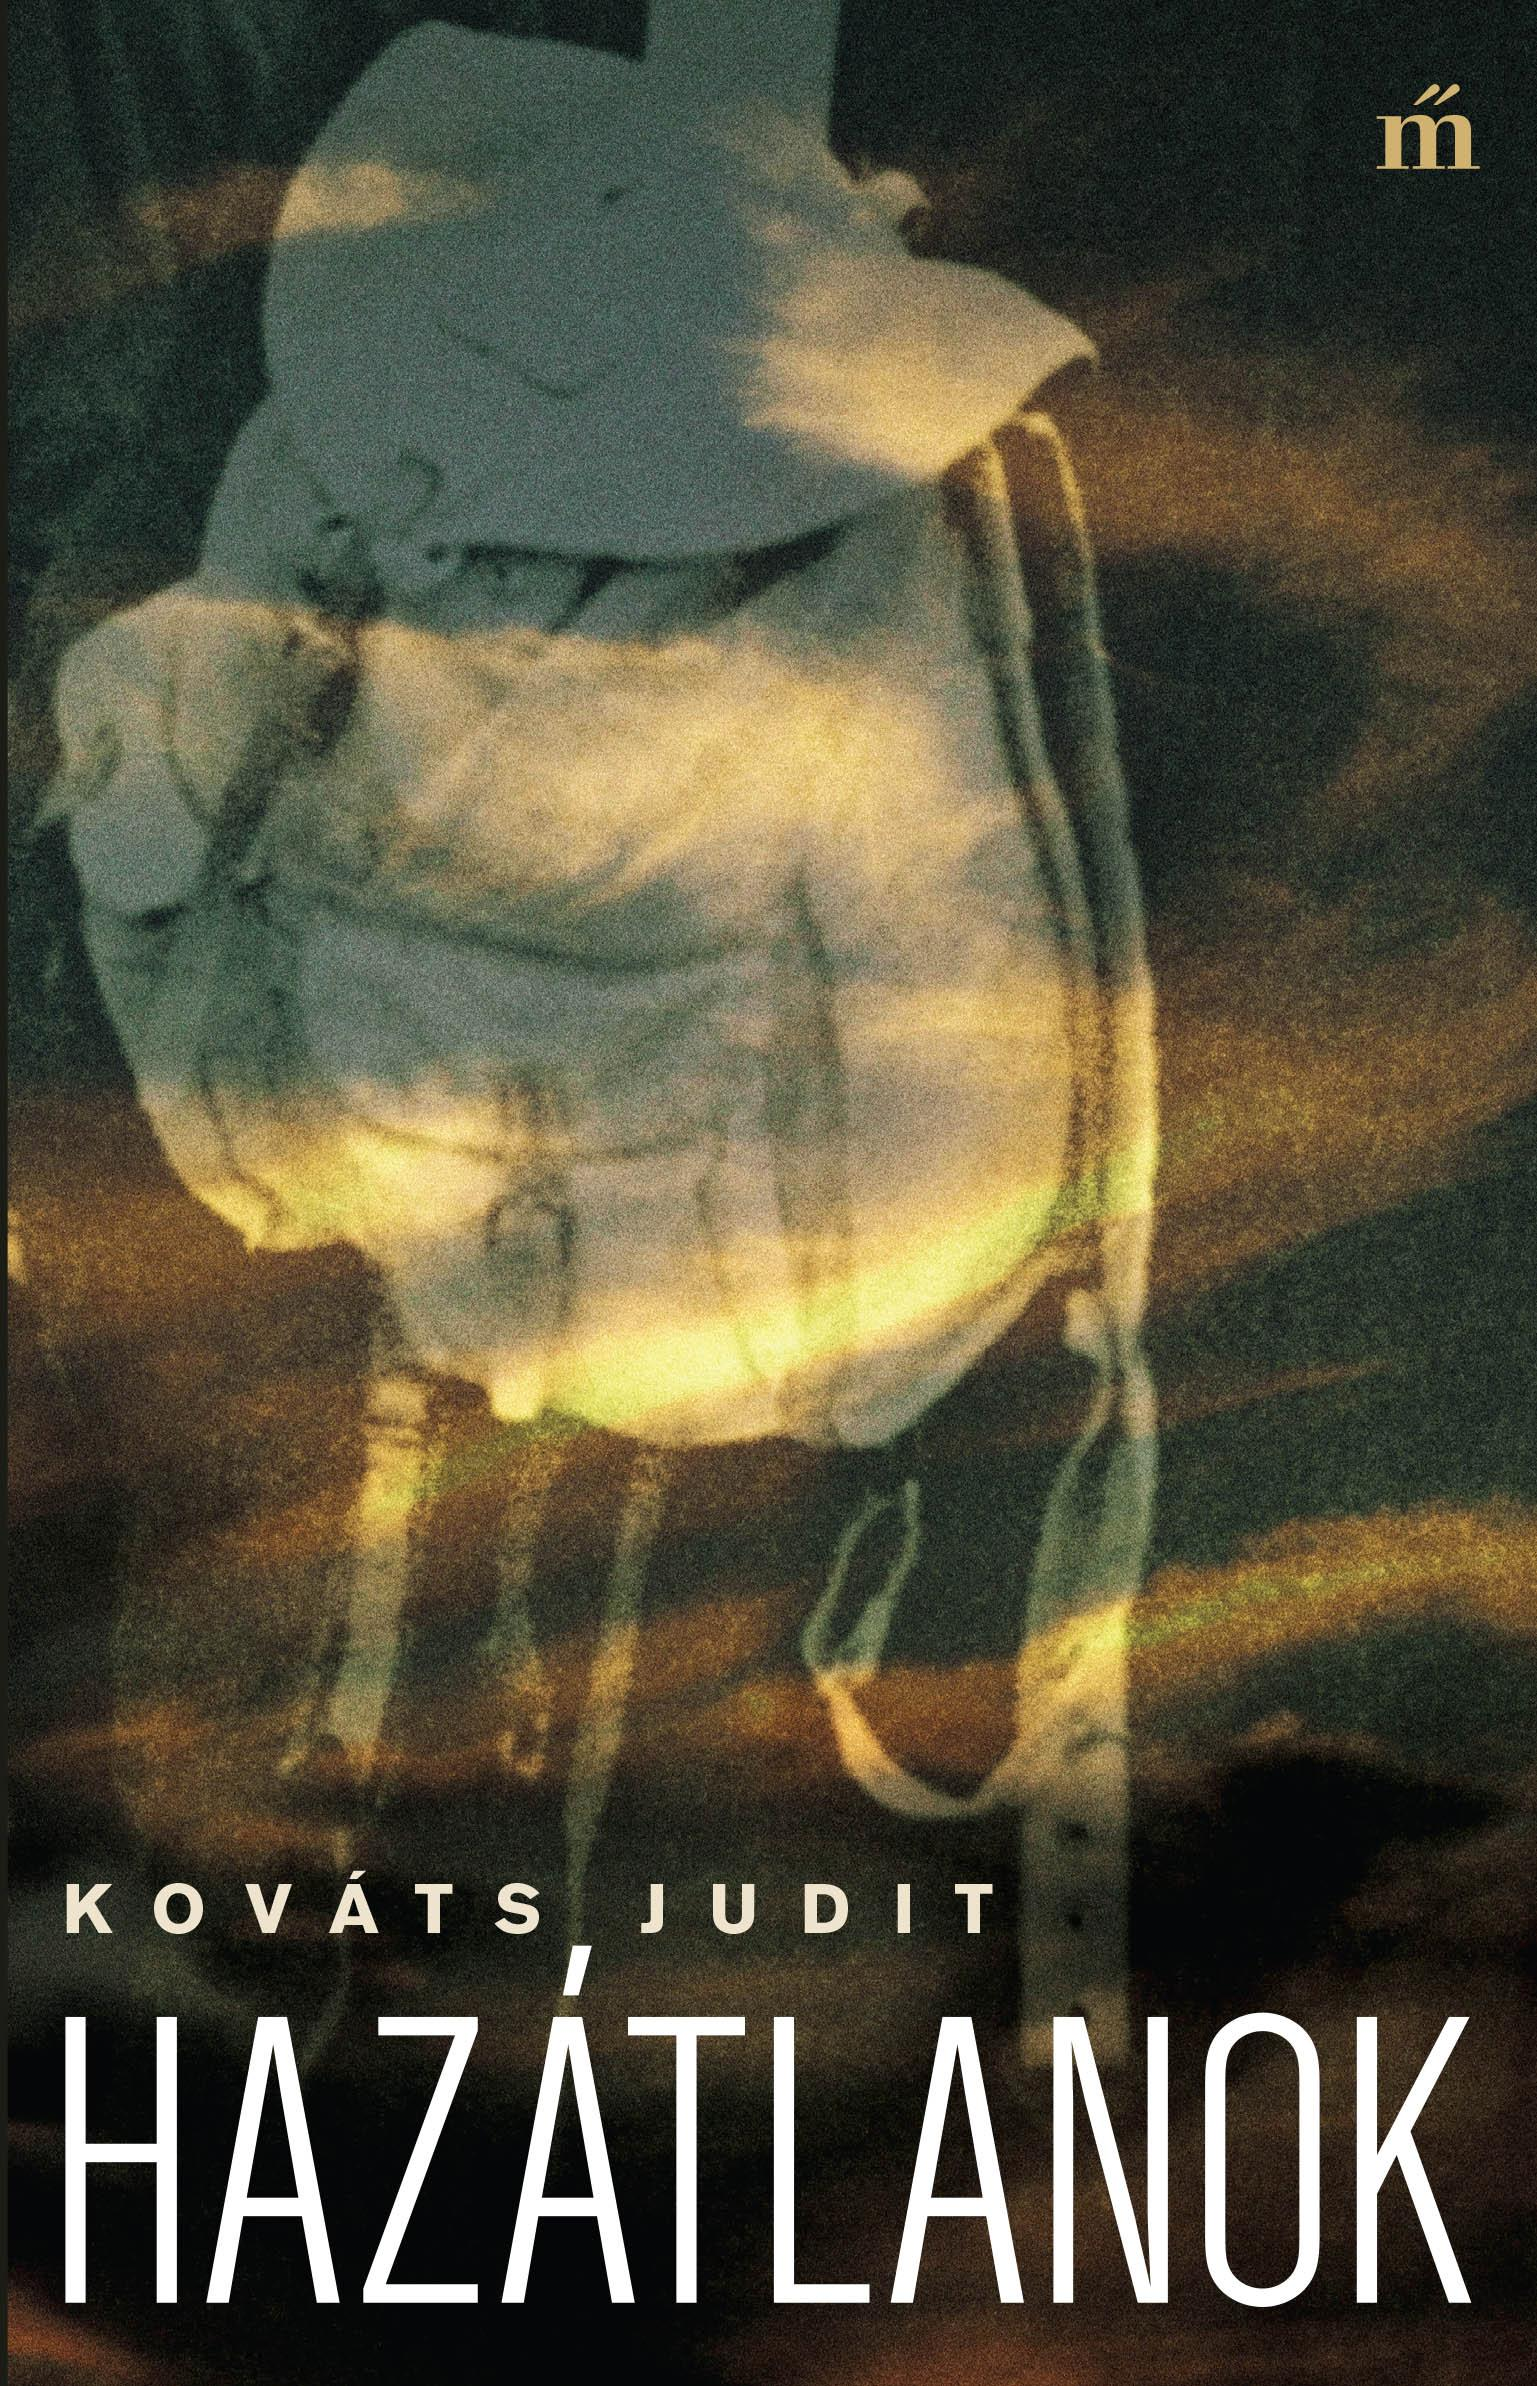 Kováts Judit: Hazátlanok